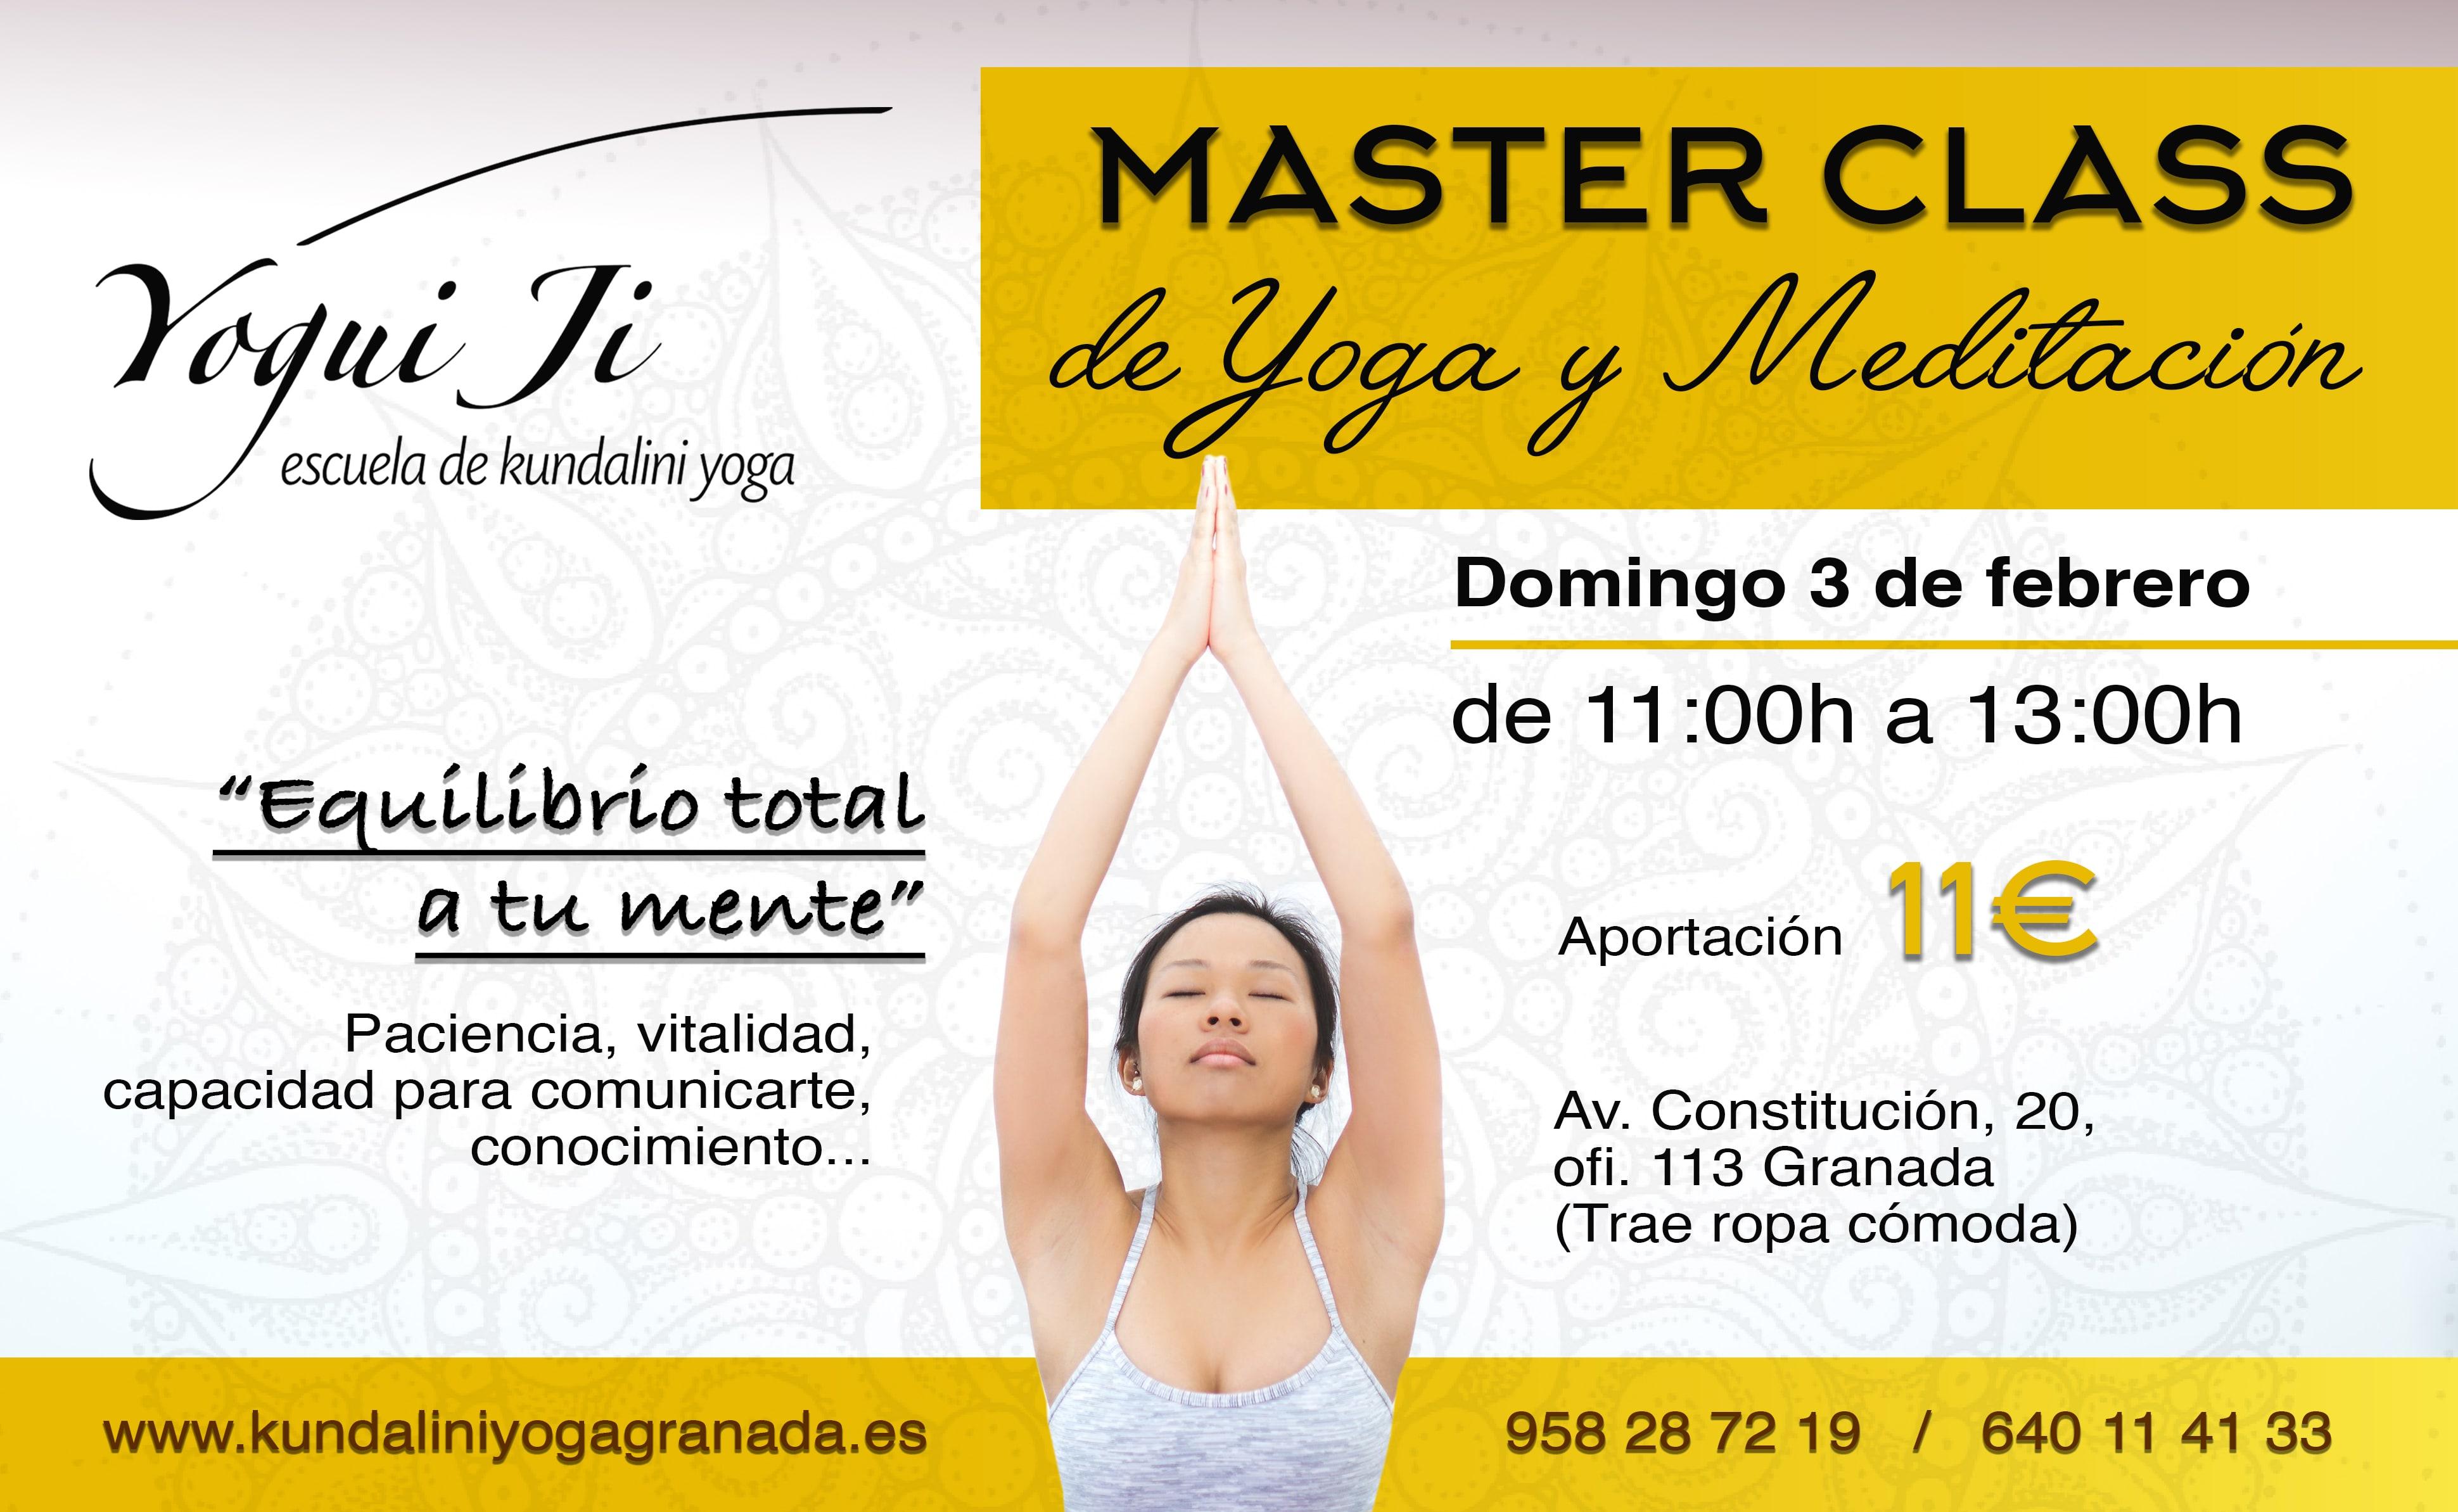 Escuela de Kundalini Yoga – Yogui Ji Granada » Master class de yoga ... b1241ebac18b